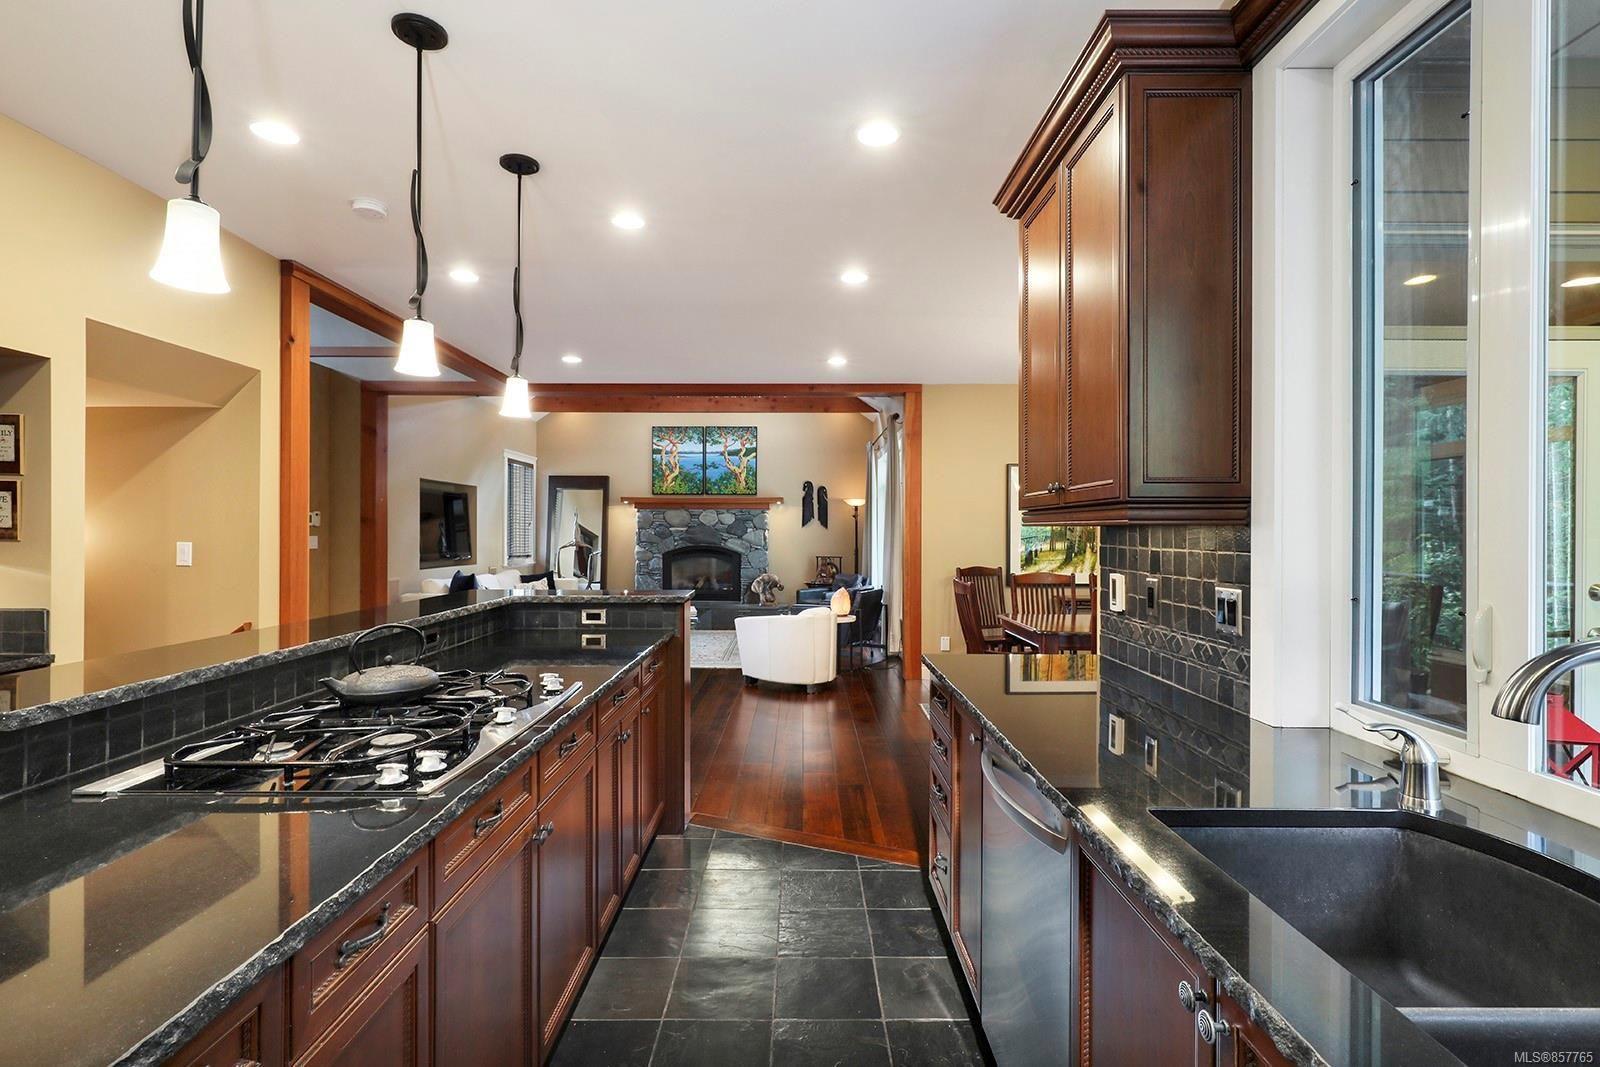 Photo 19: Photos: 1516 Highridge Dr in : CV Comox (Town of) House for sale (Comox Valley)  : MLS®# 857765